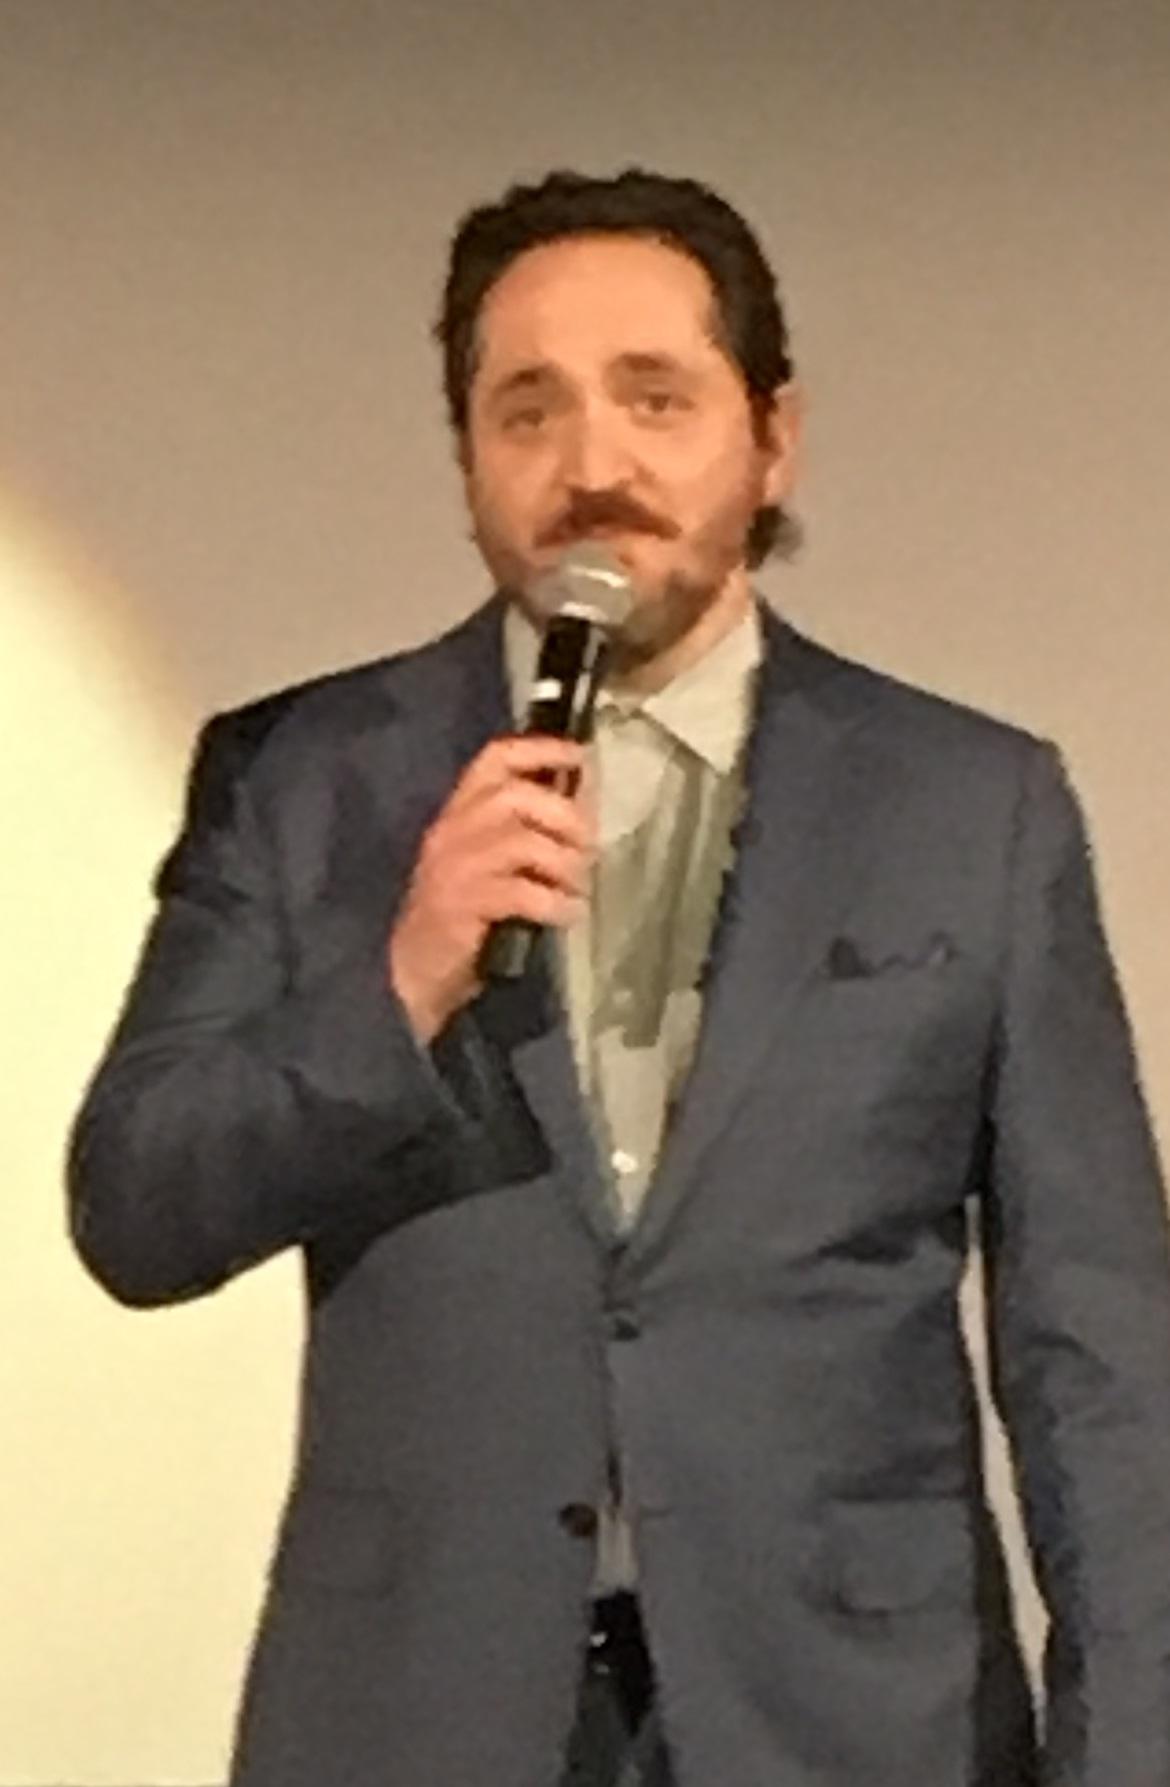 Ben Falcone - Wikipedia